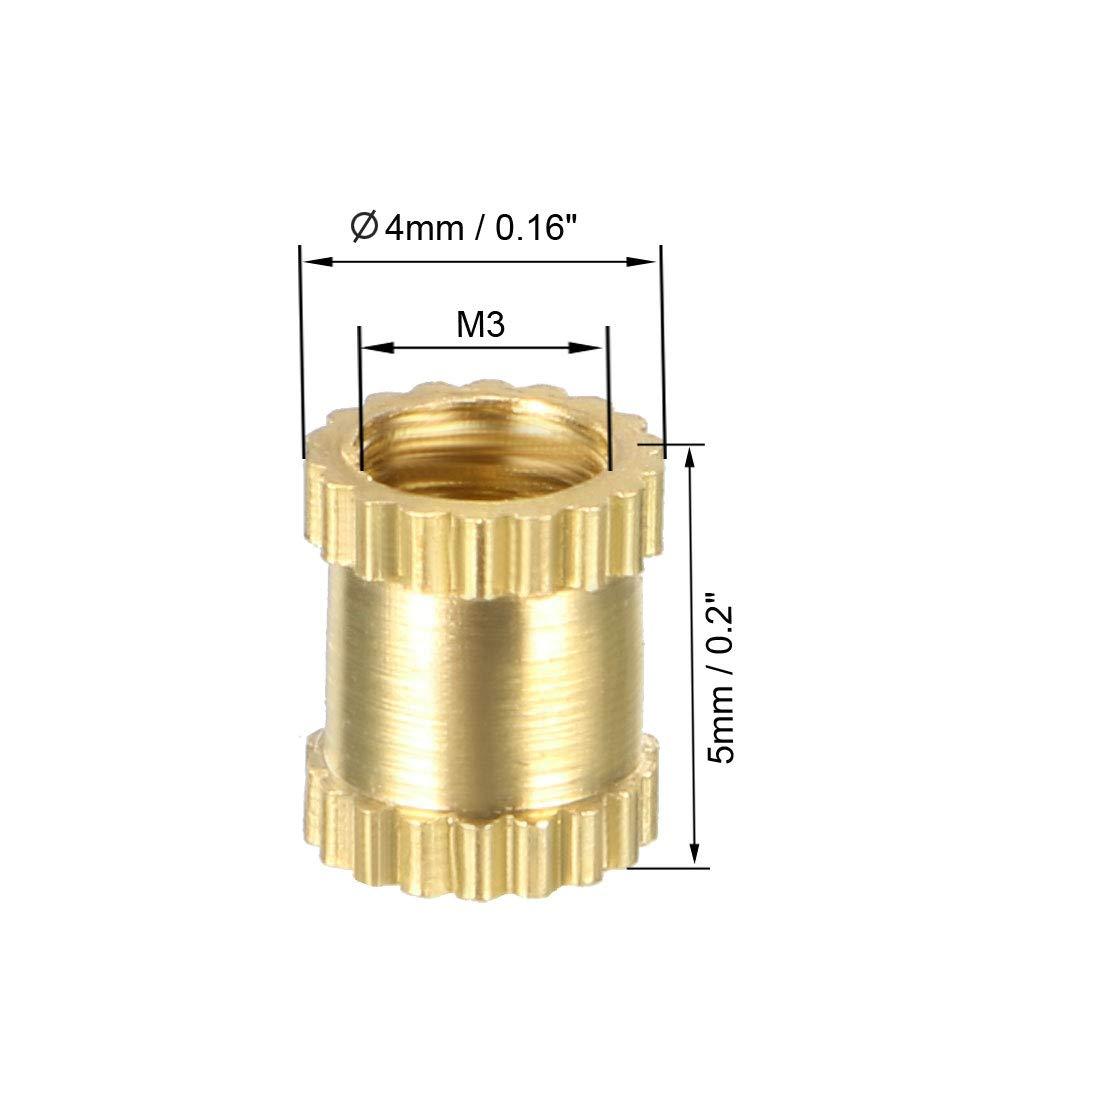 uxcell Knurled Threaded Insert OD Female Thread Brass Embedment Nuts L x 5mm M4 x 5mm Pack of 50